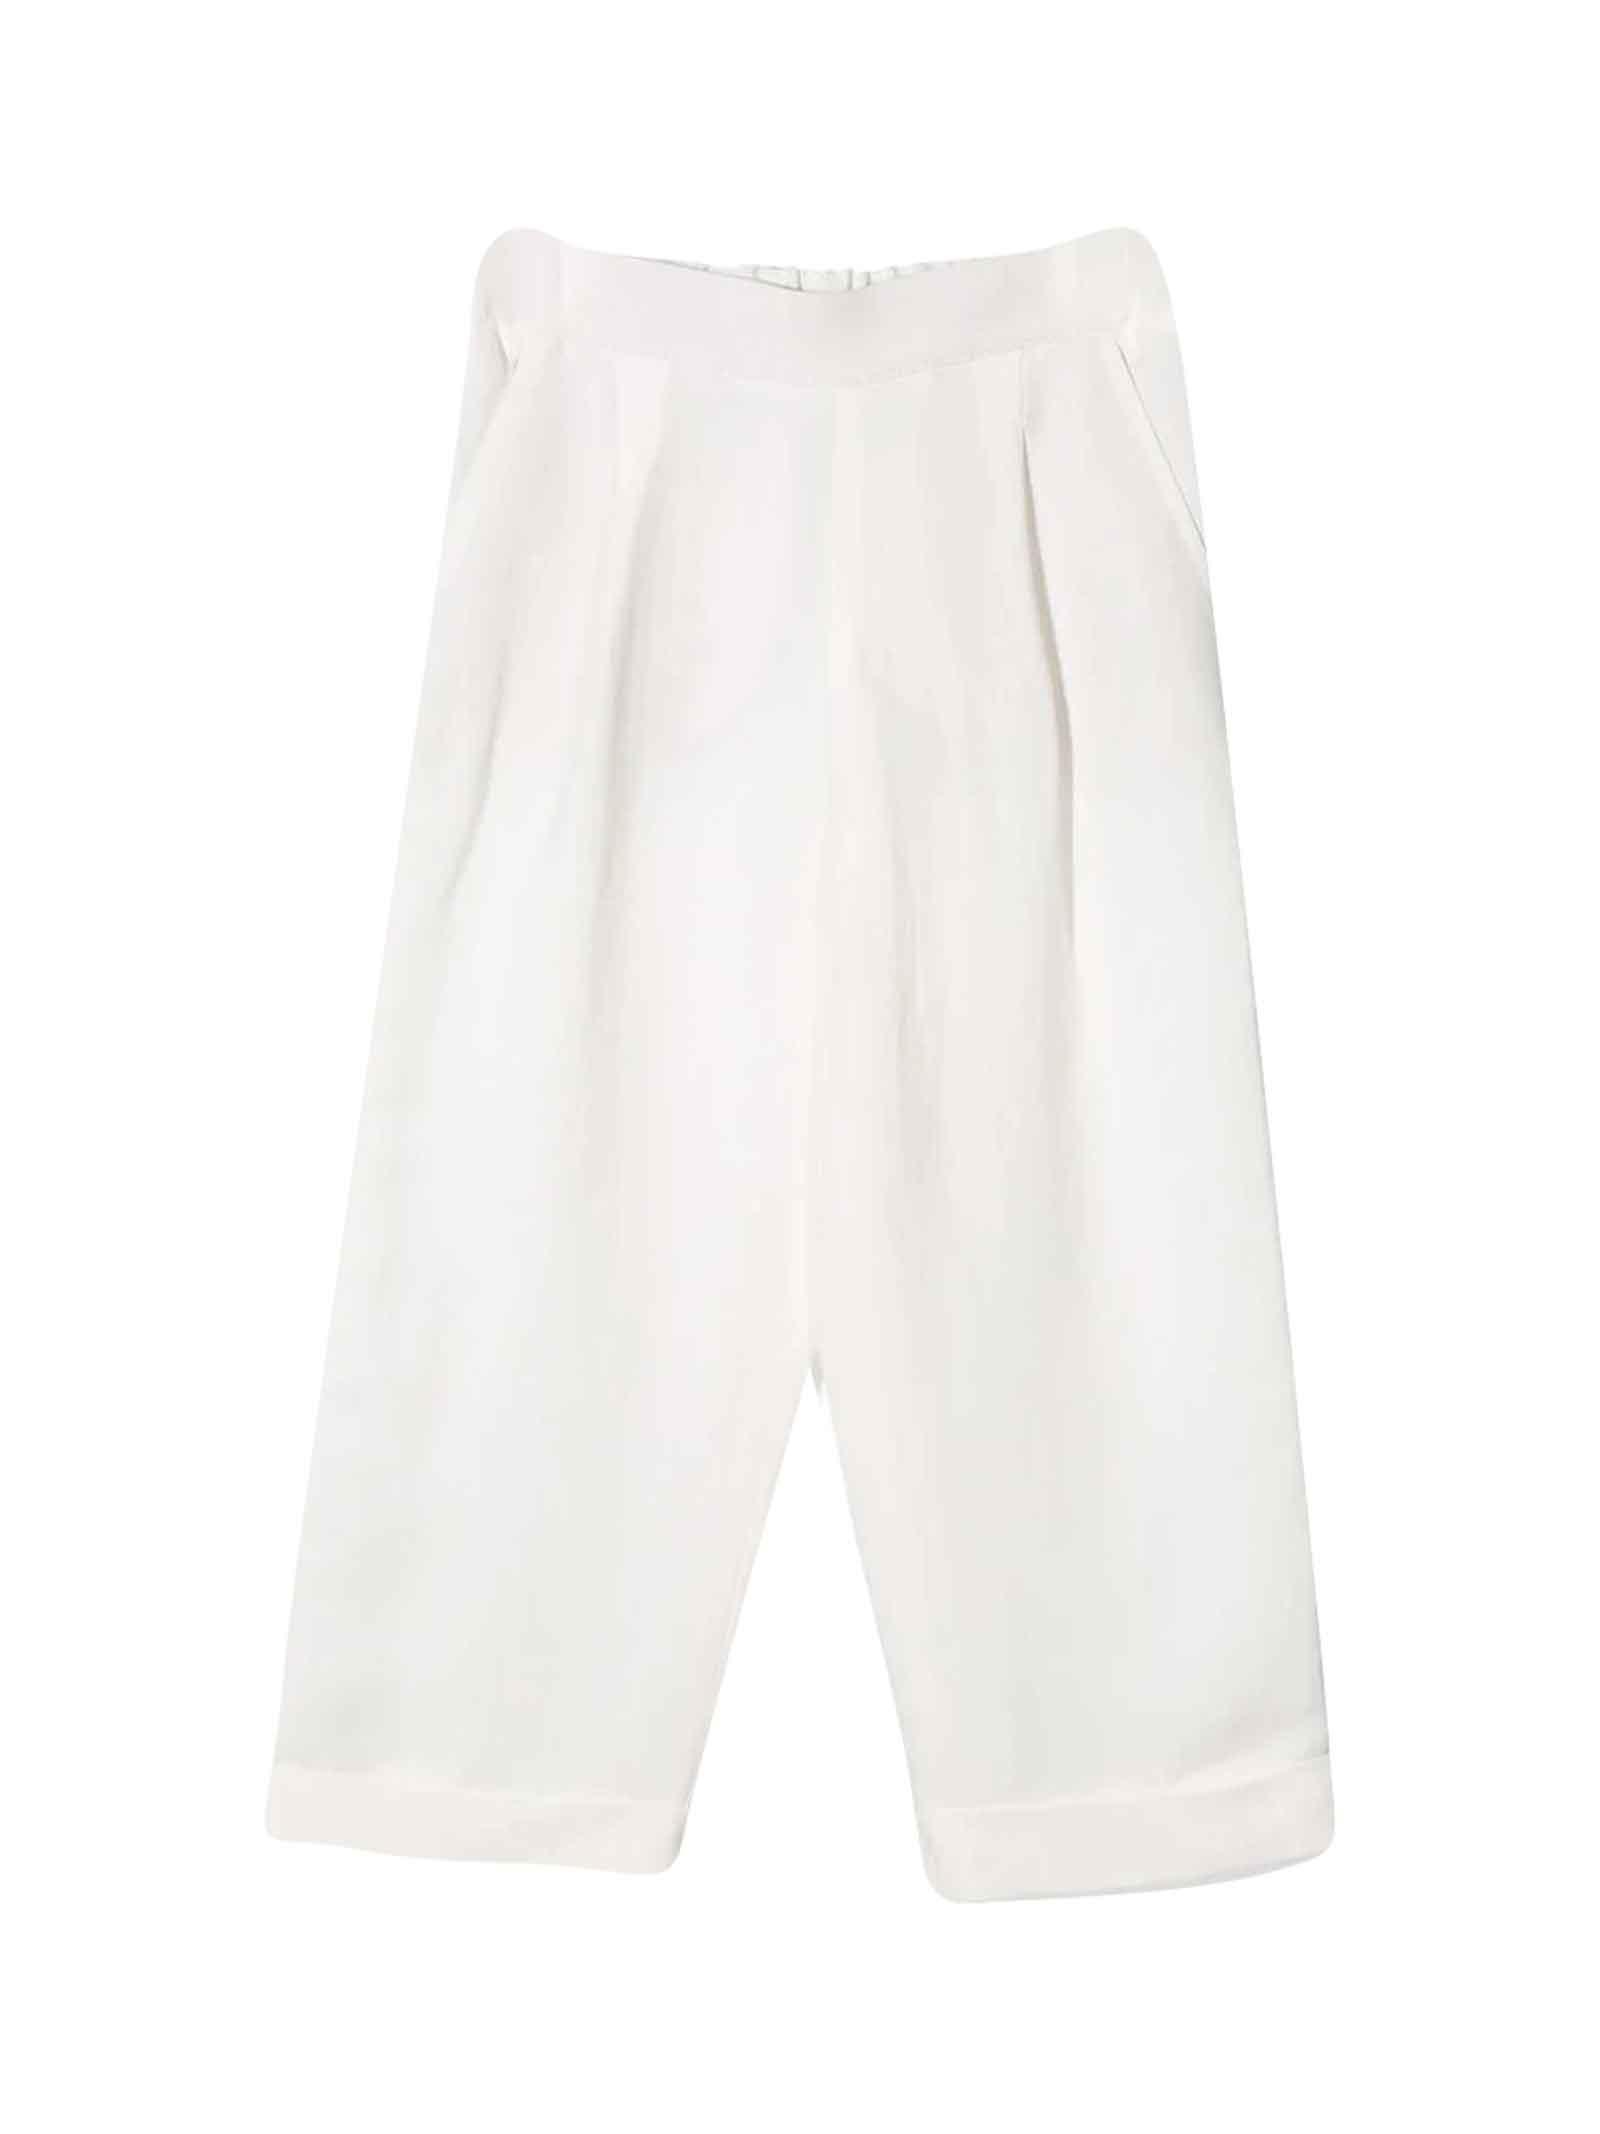 Buy Brunello Cucinelli White Dress online, shop Brunello Cucinelli with free shipping